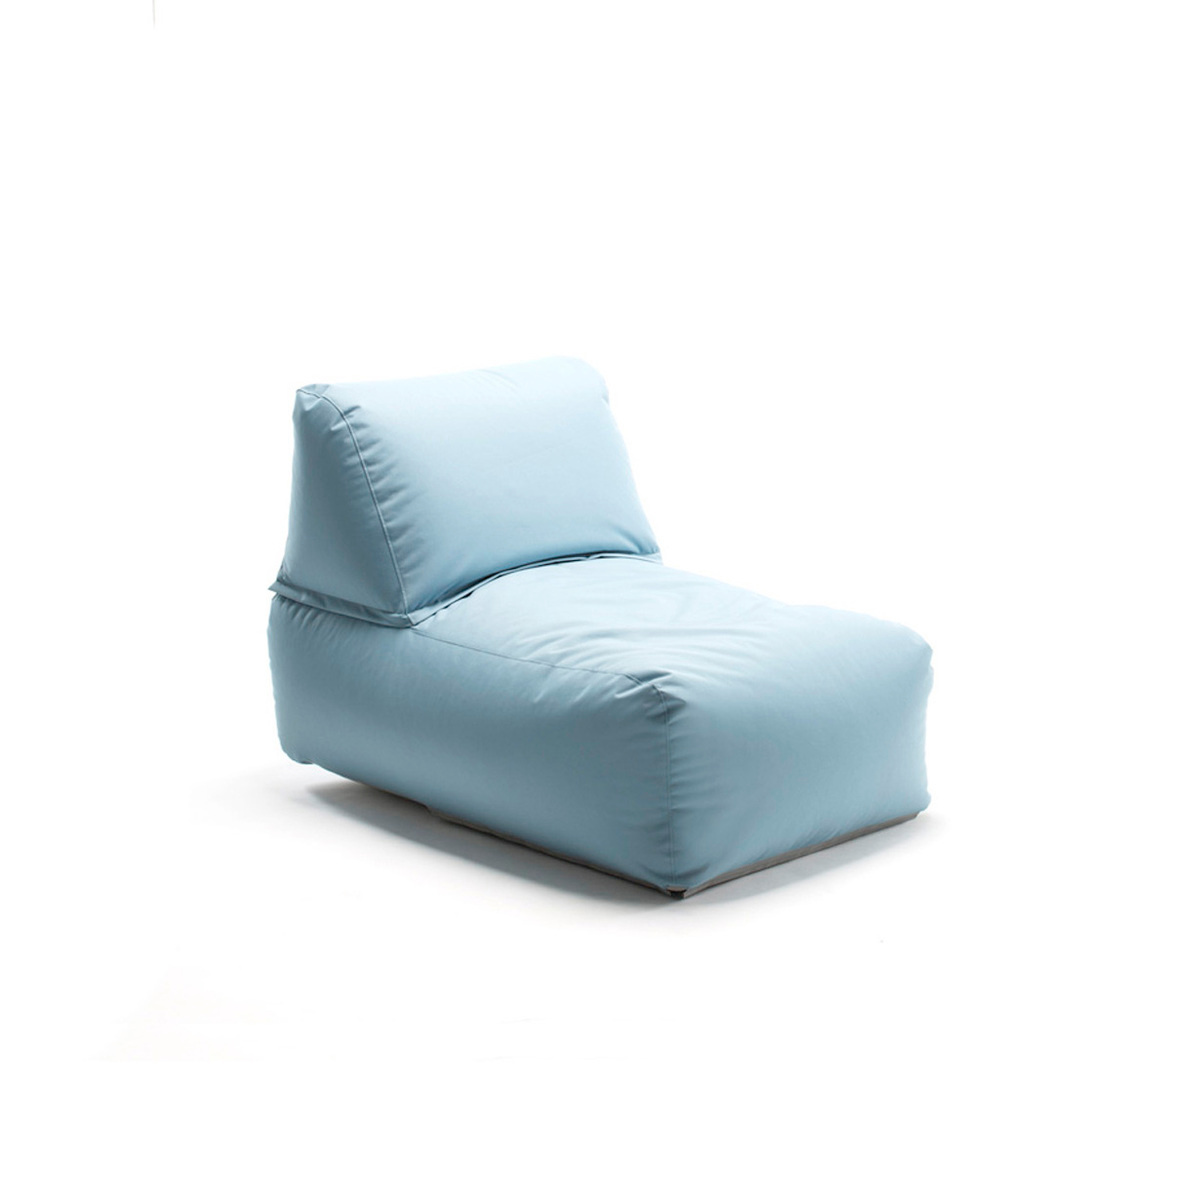 Chaise longue da esterno zipp by sitting bull lovethesign - Chaise longue da esterno ...